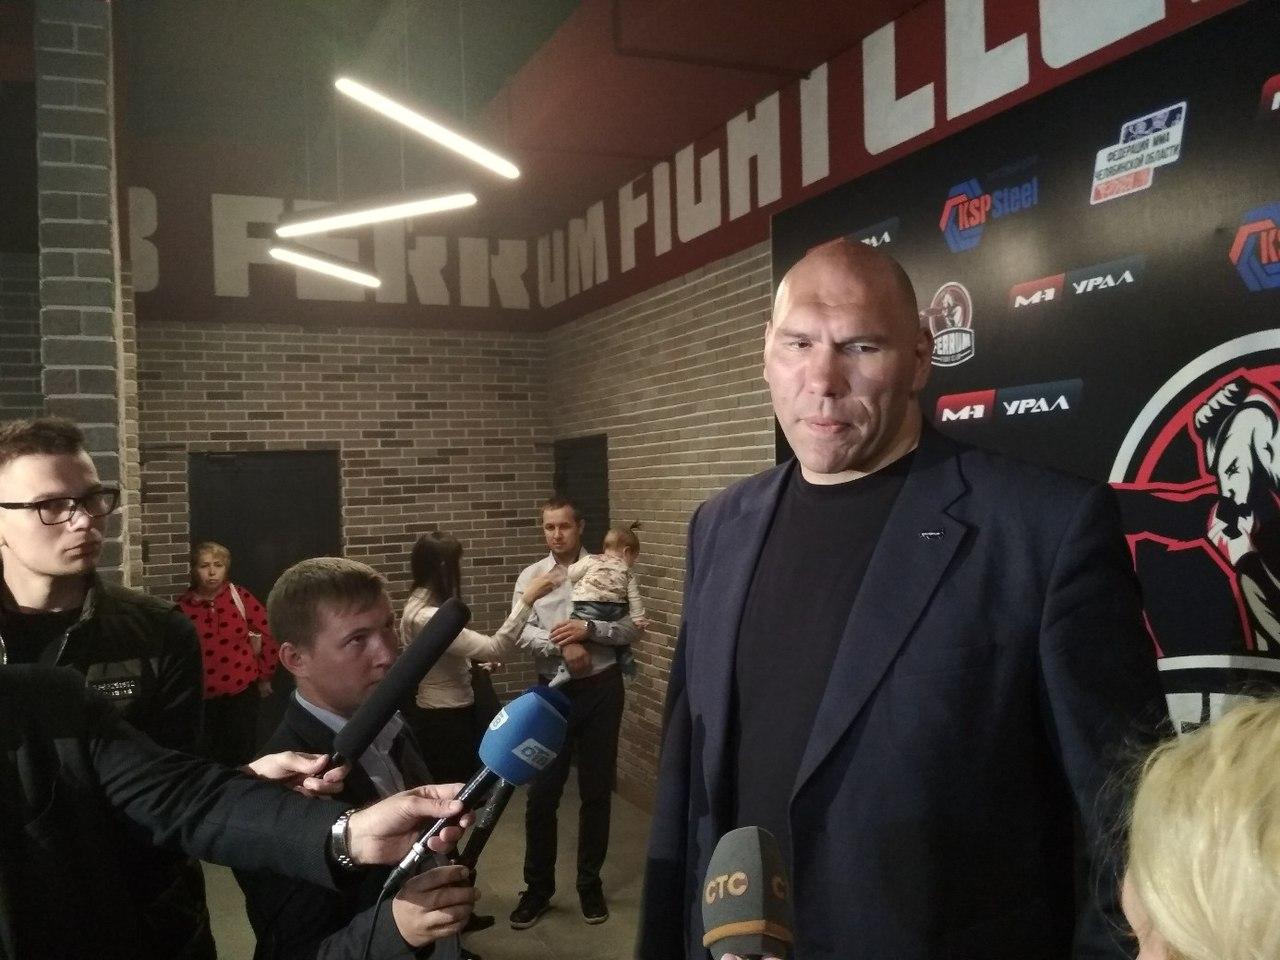 Николай Валуев на открытие зала MMA в Челябинске